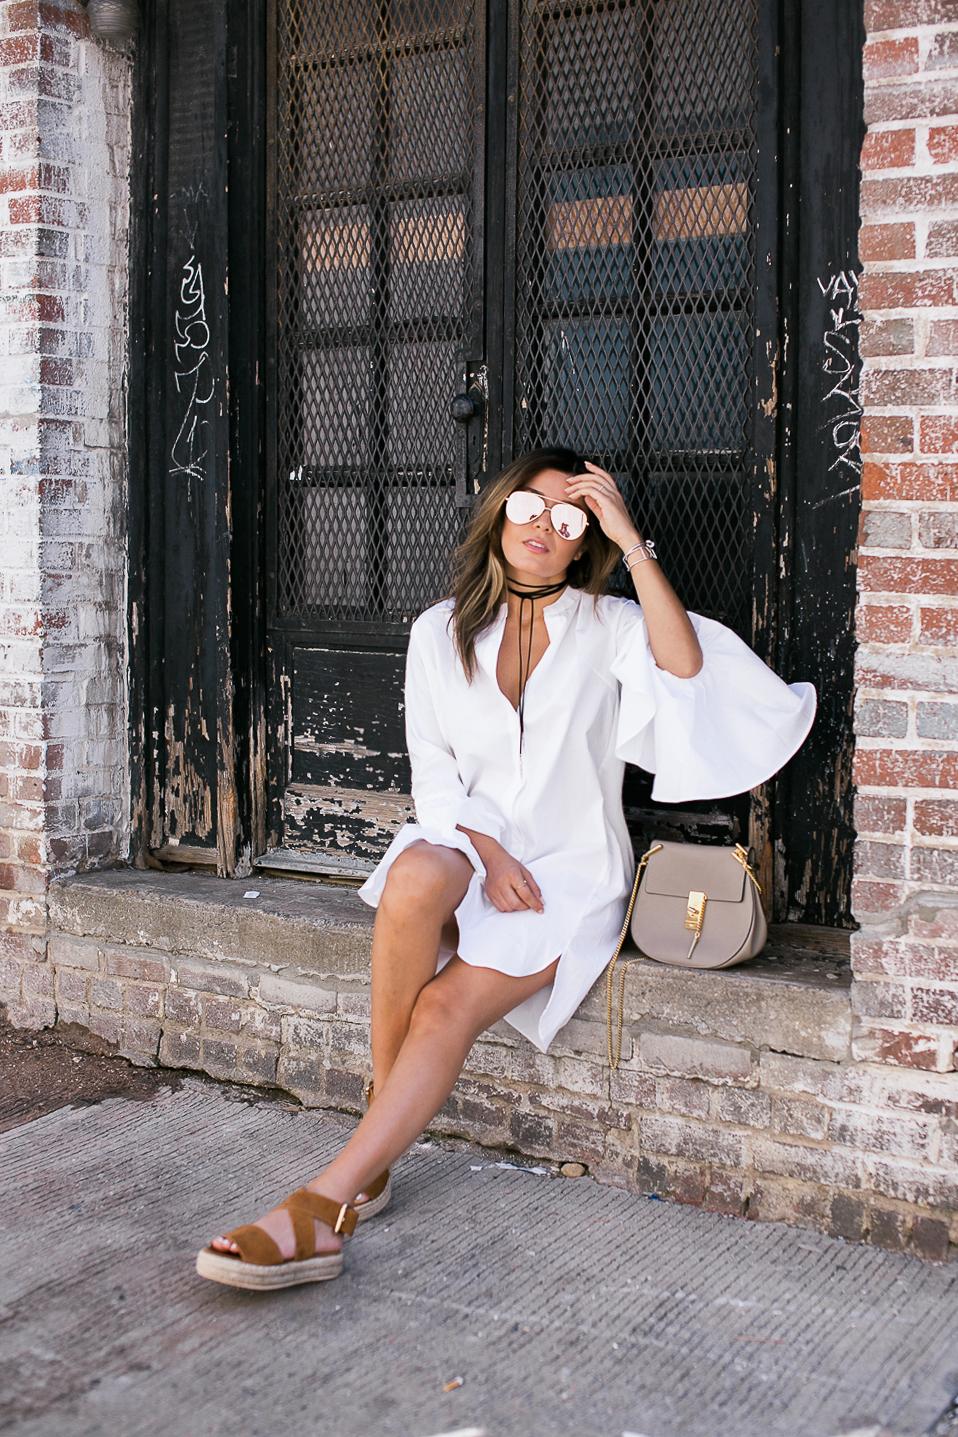 Style MBA wears Storets Shirtdress and Raye Sandals